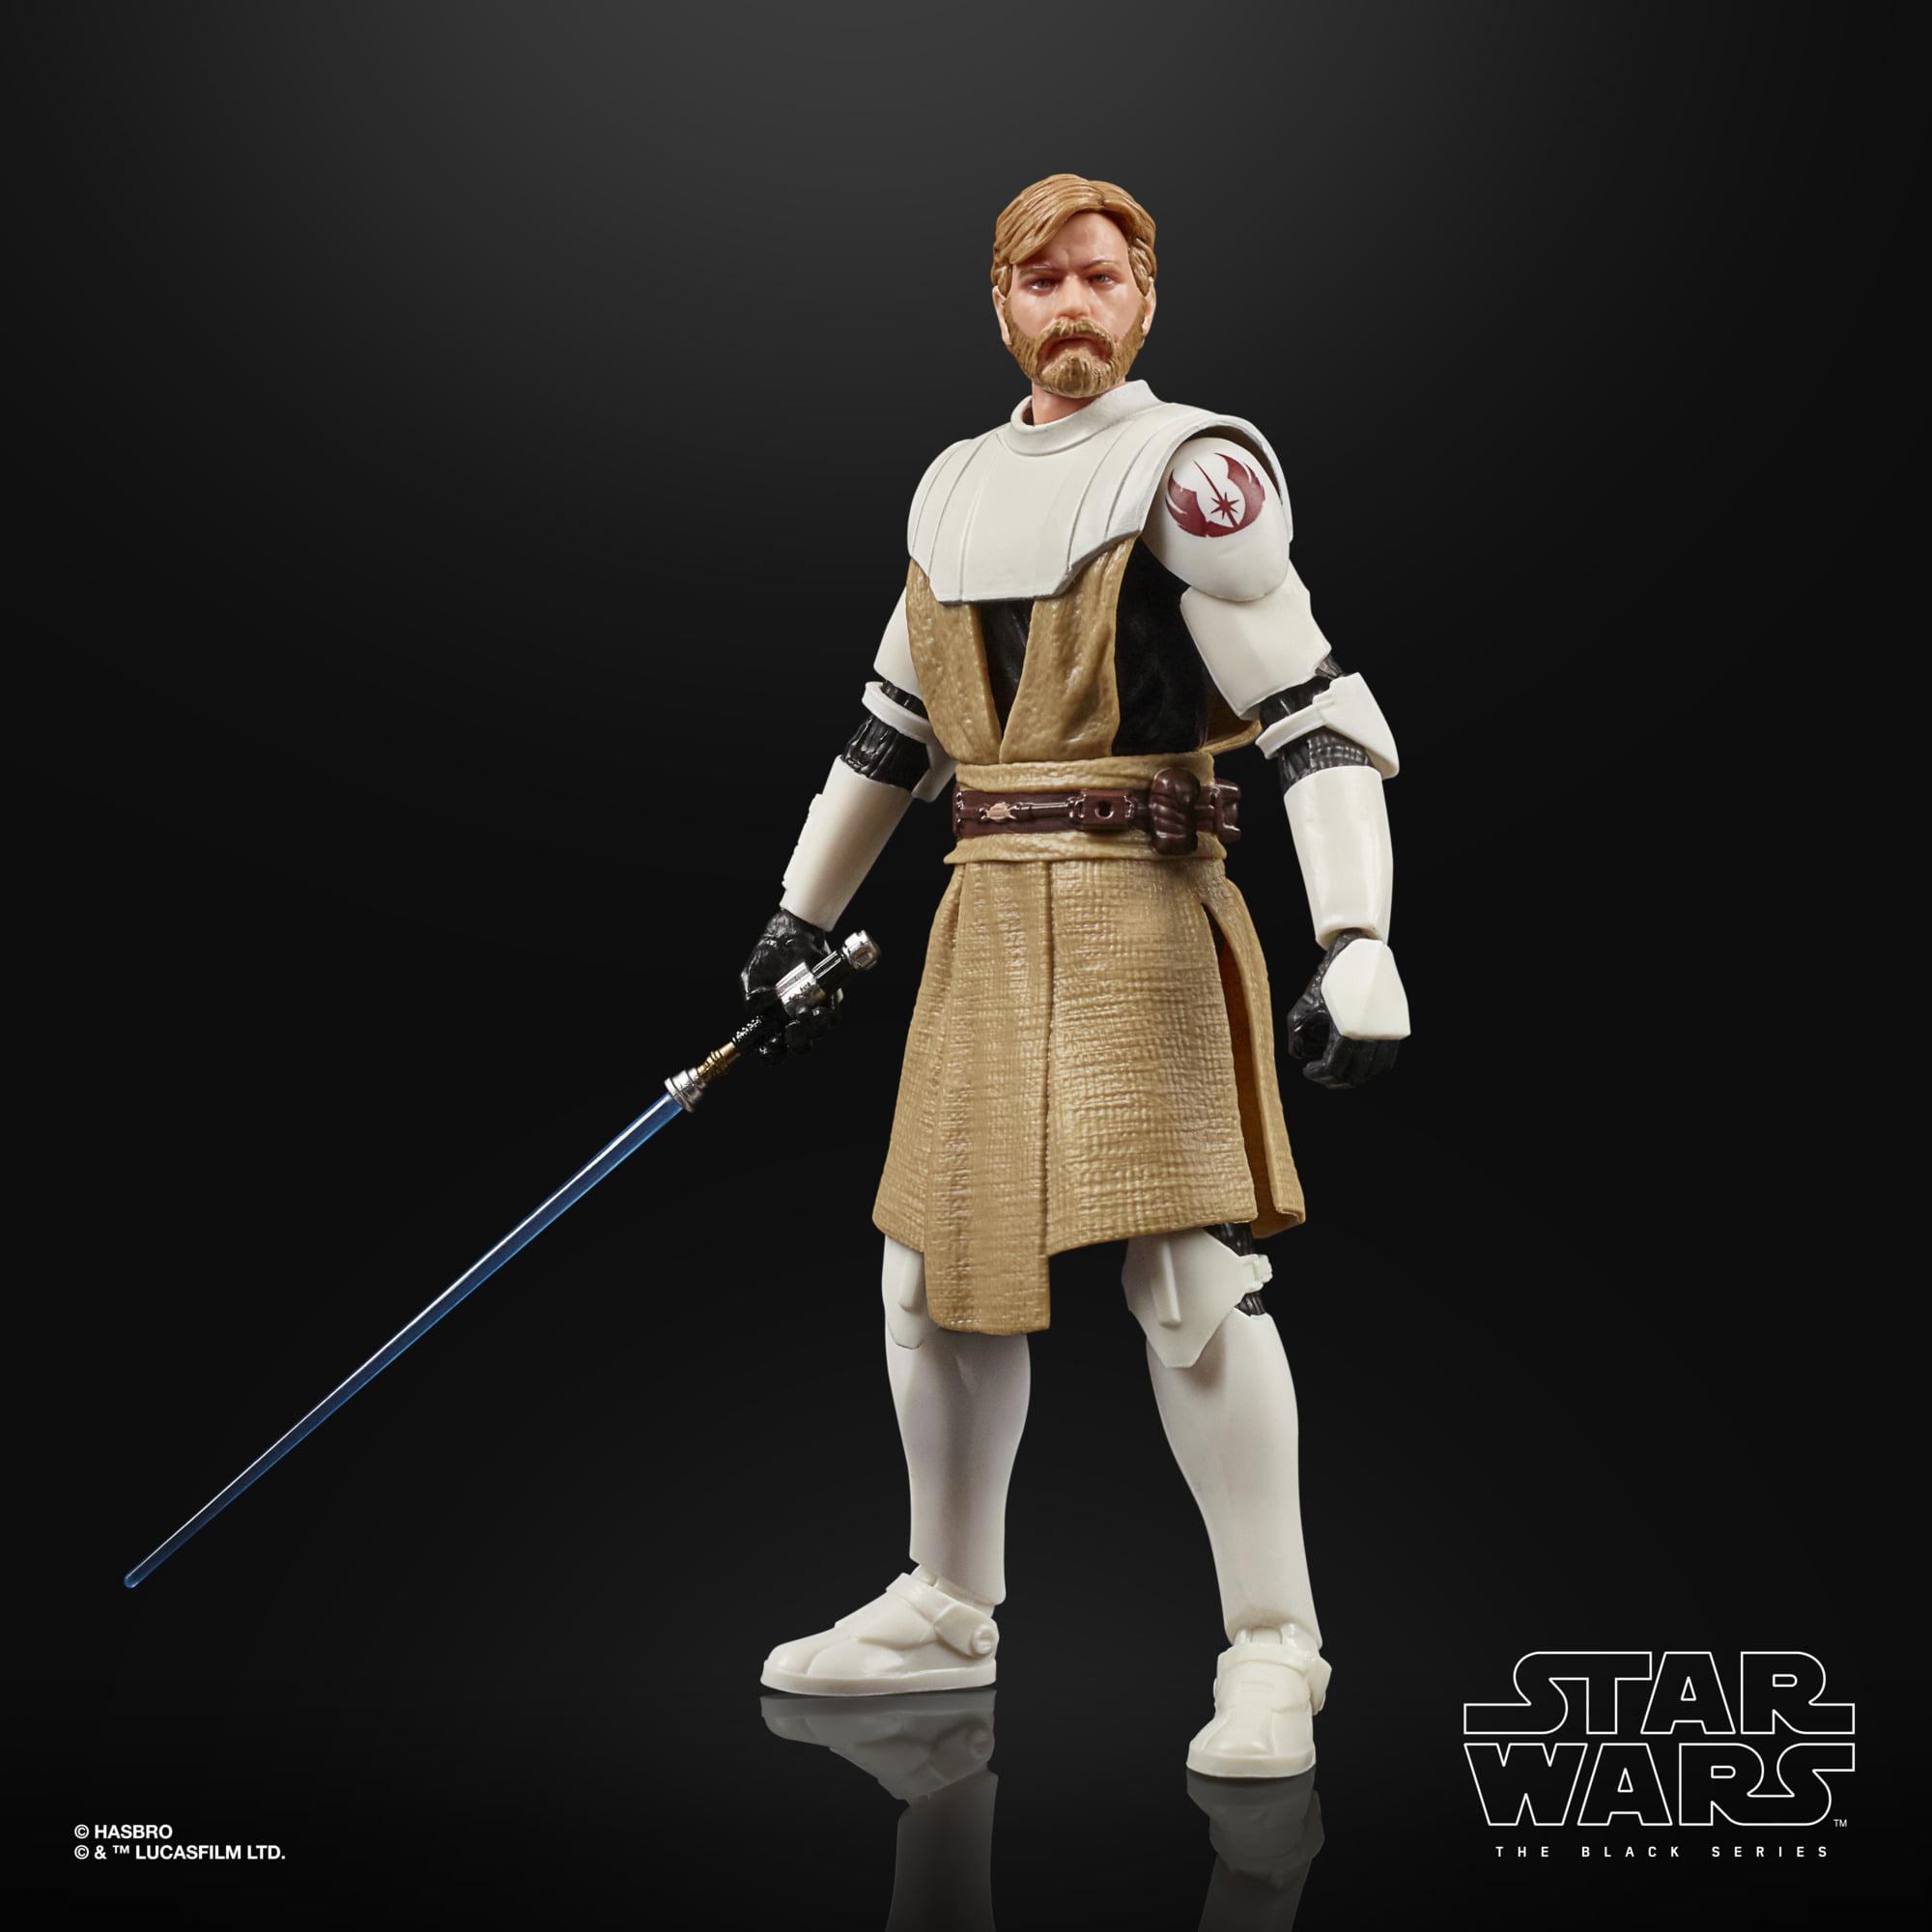 Black-Series-Obi-Wan-Kenobi-TCW-Lucasfilm-50th-Anniversary-Loose-2.jpg